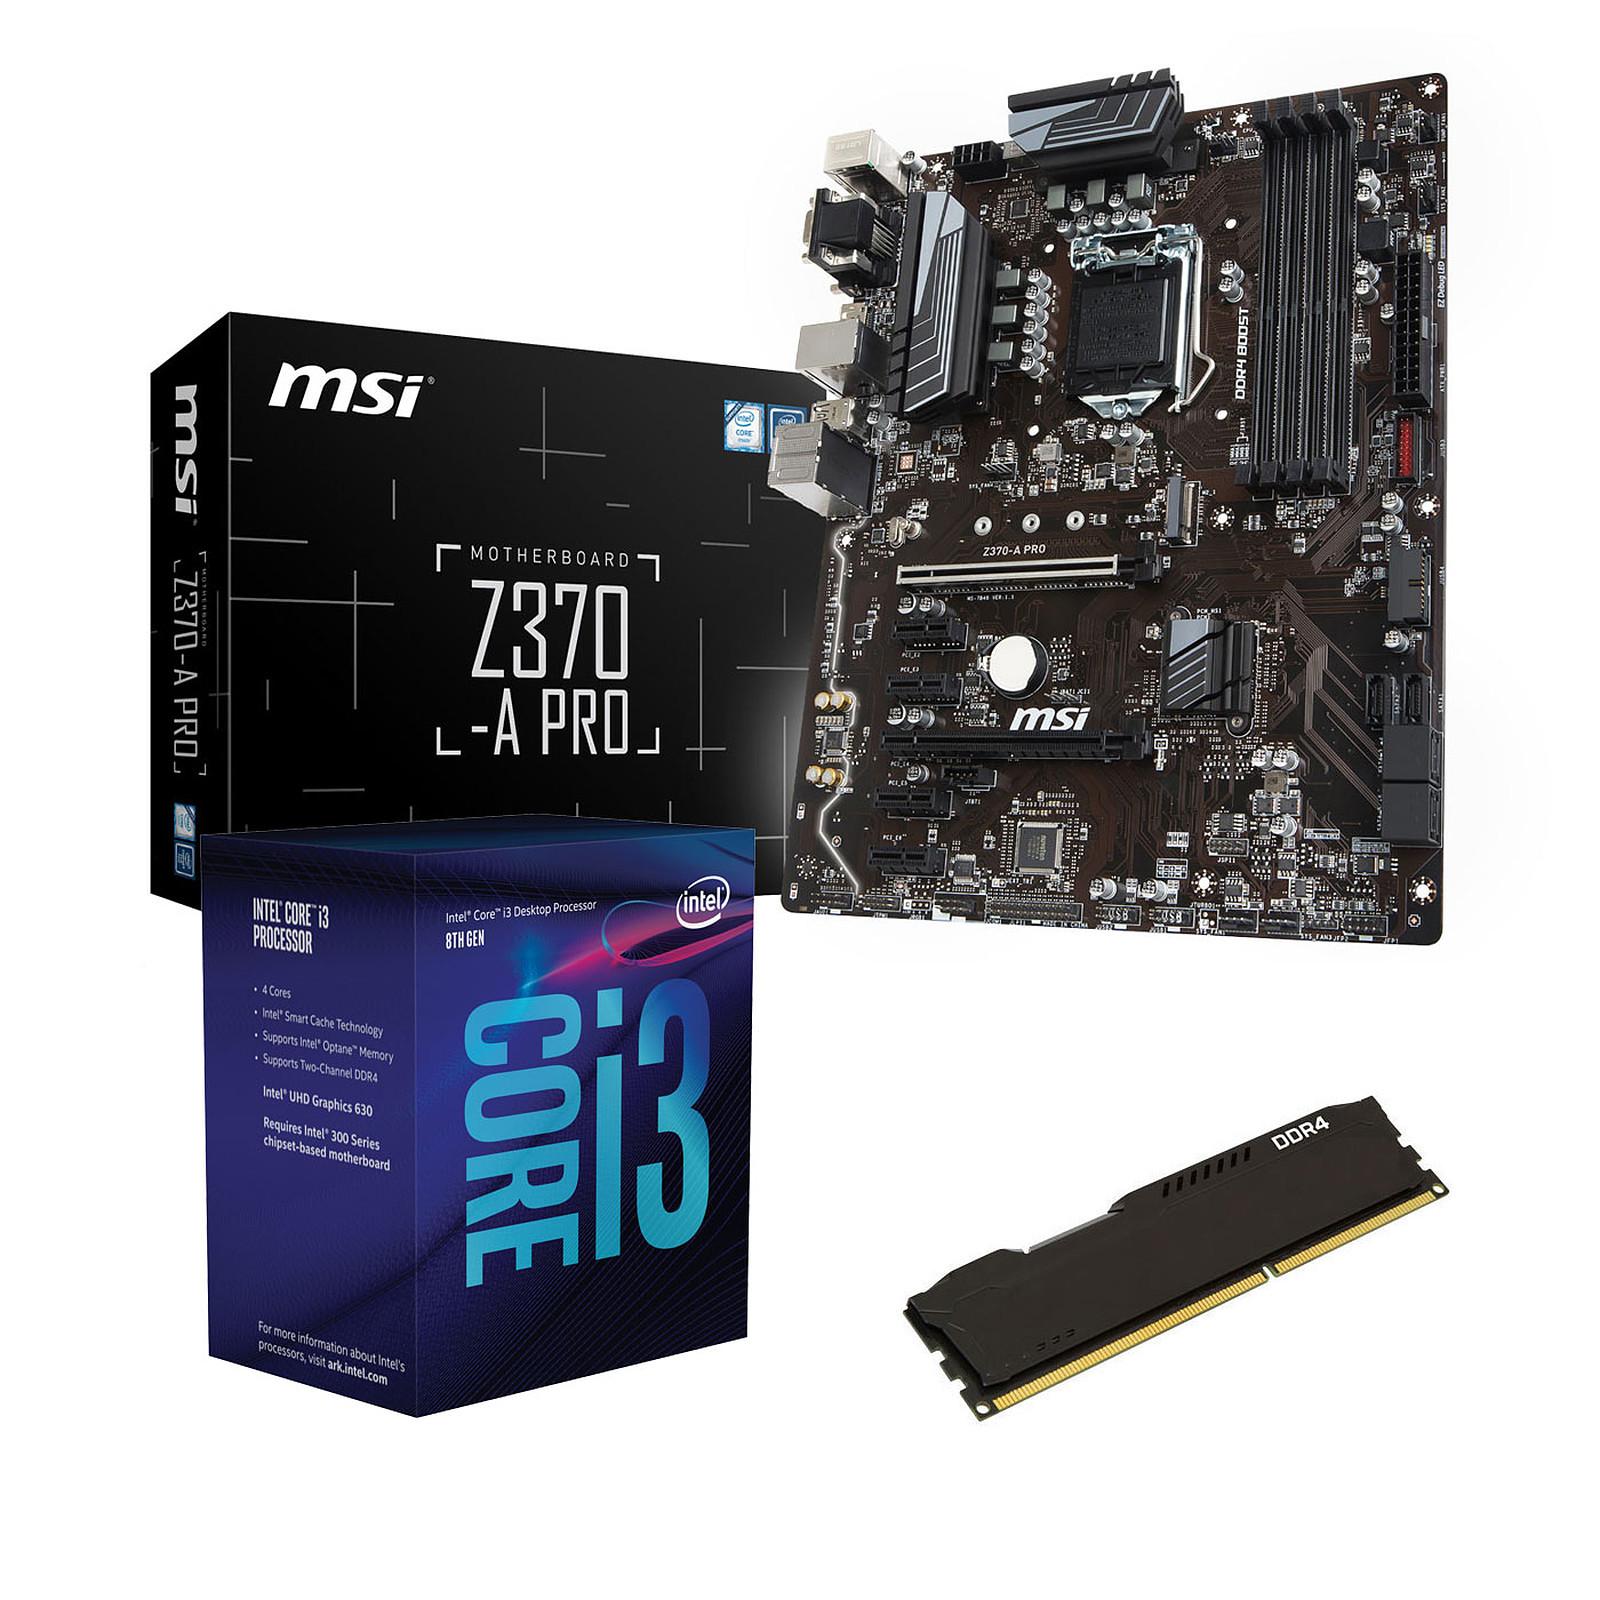 Kit Upgrade PC Core i3 MSI Z370-A PRO 4 Go